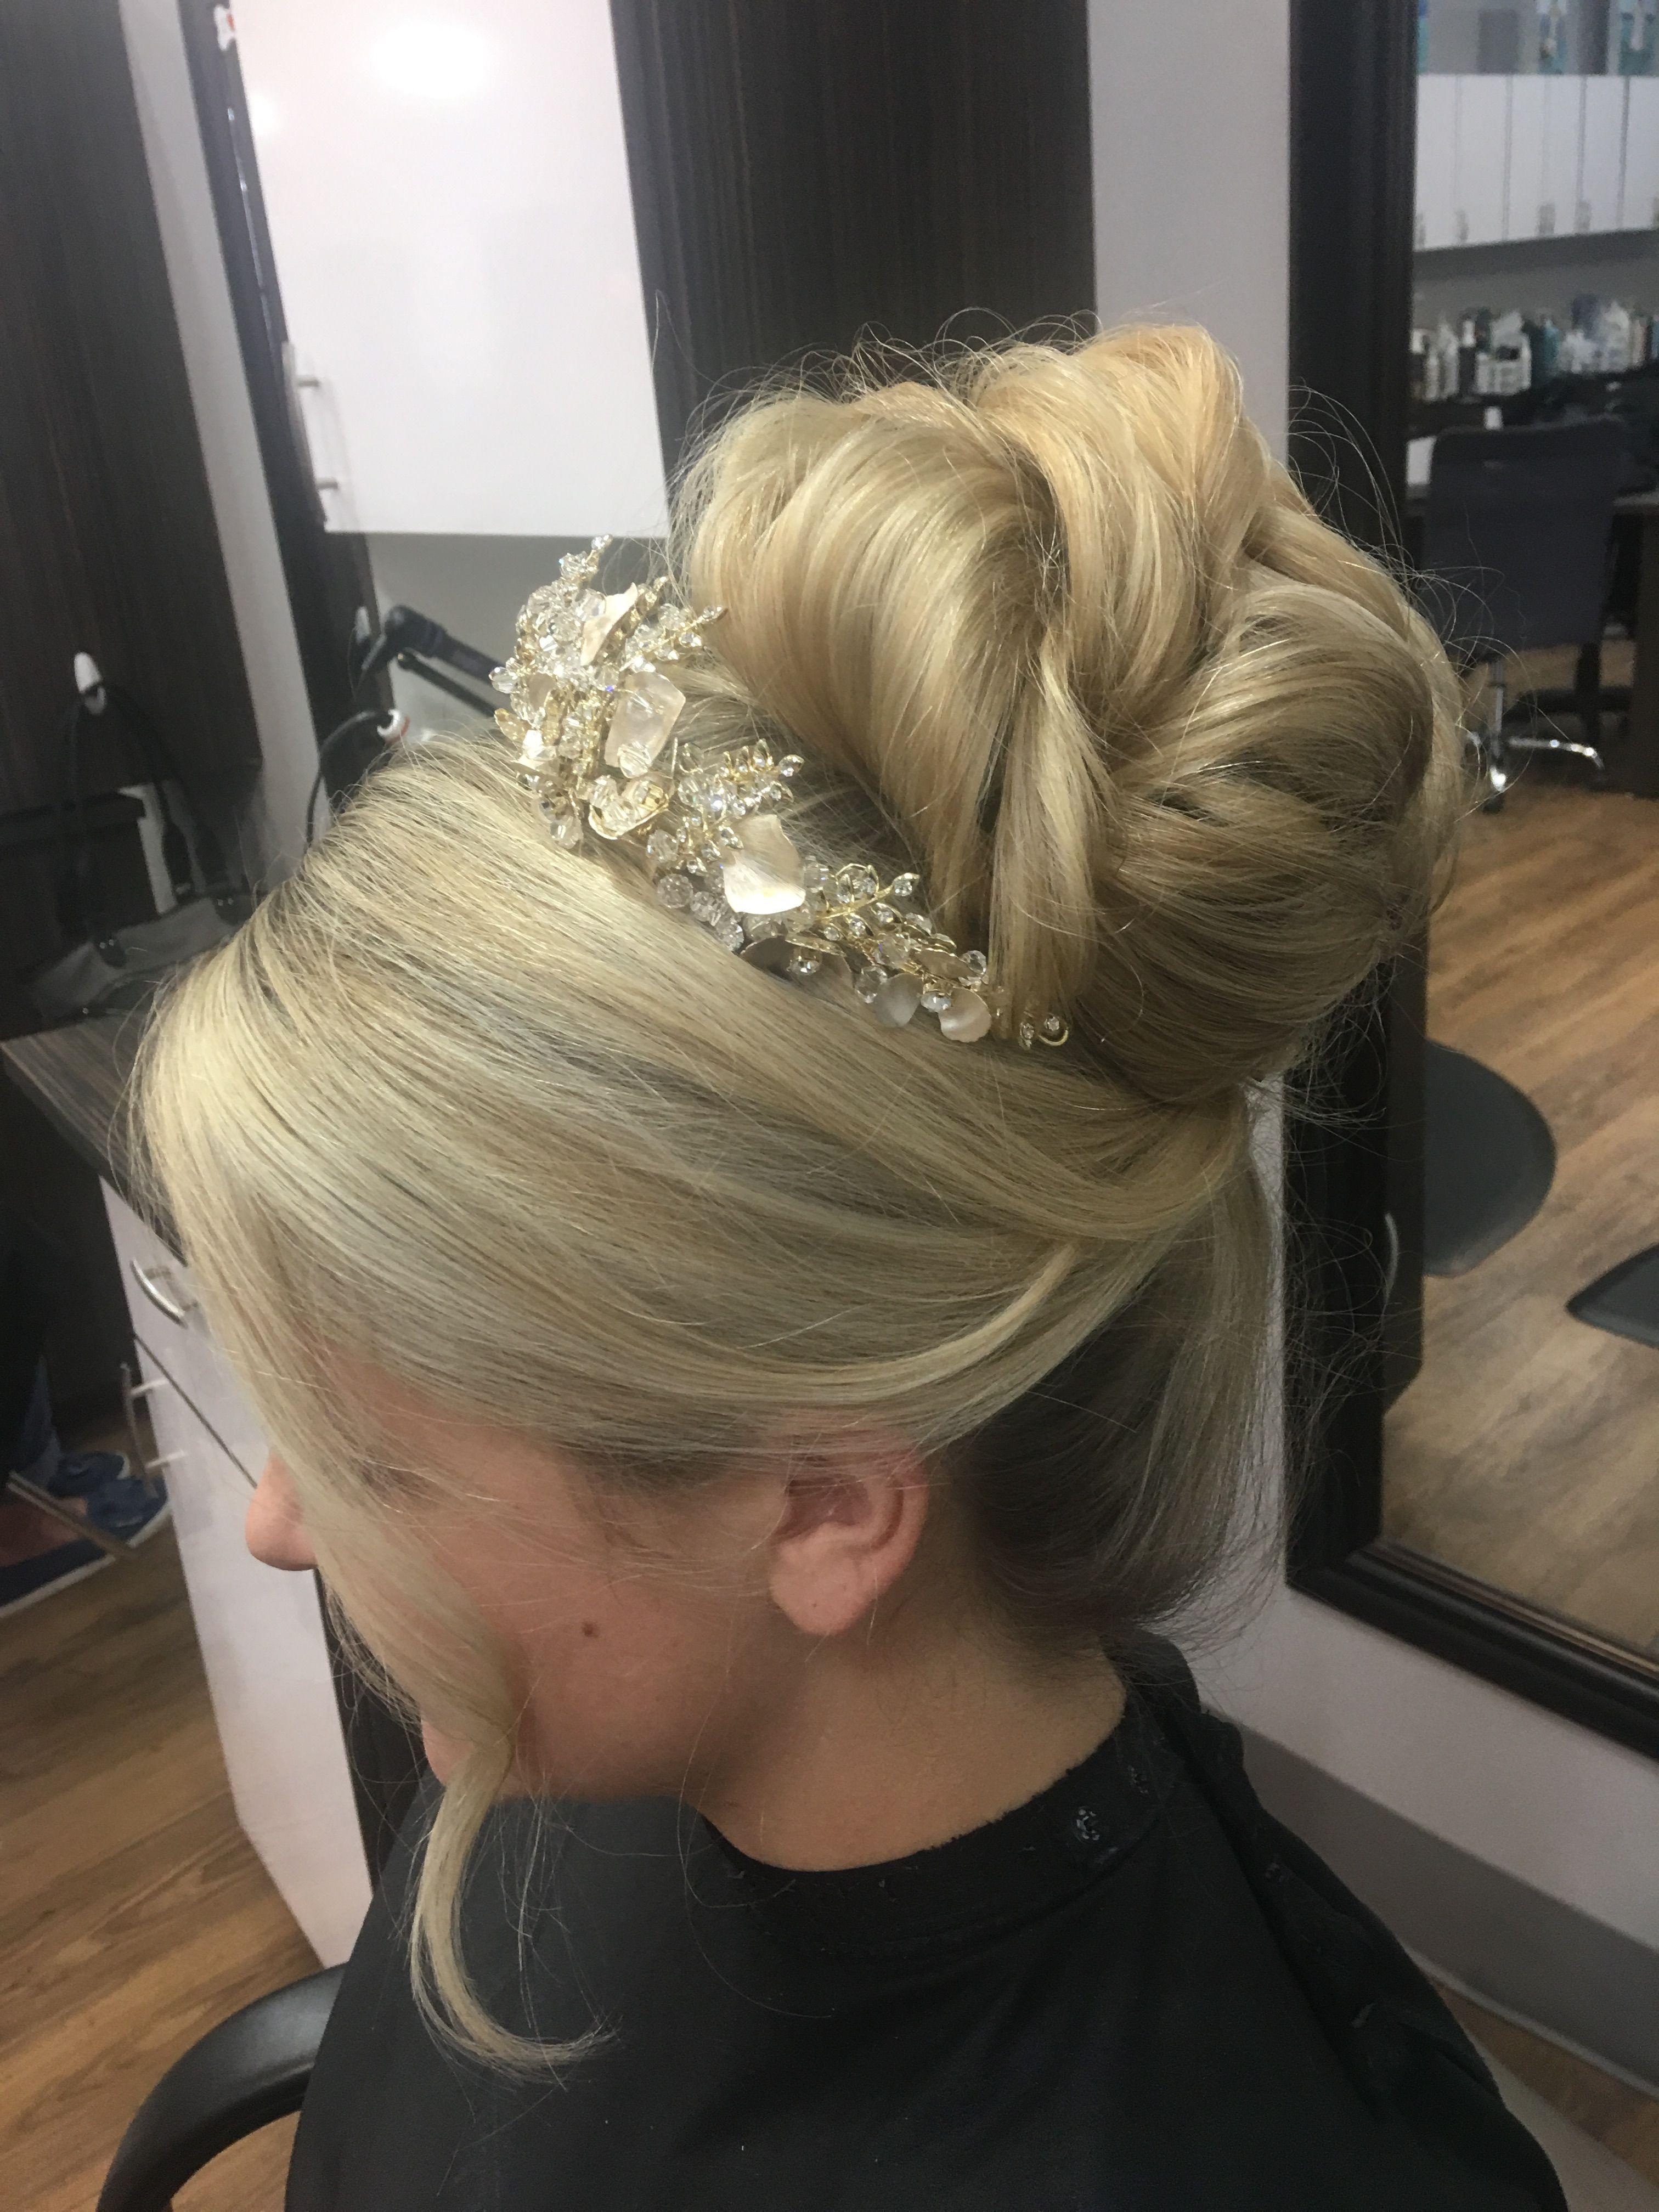 just had my hair trial. my wedding hair for november 10th